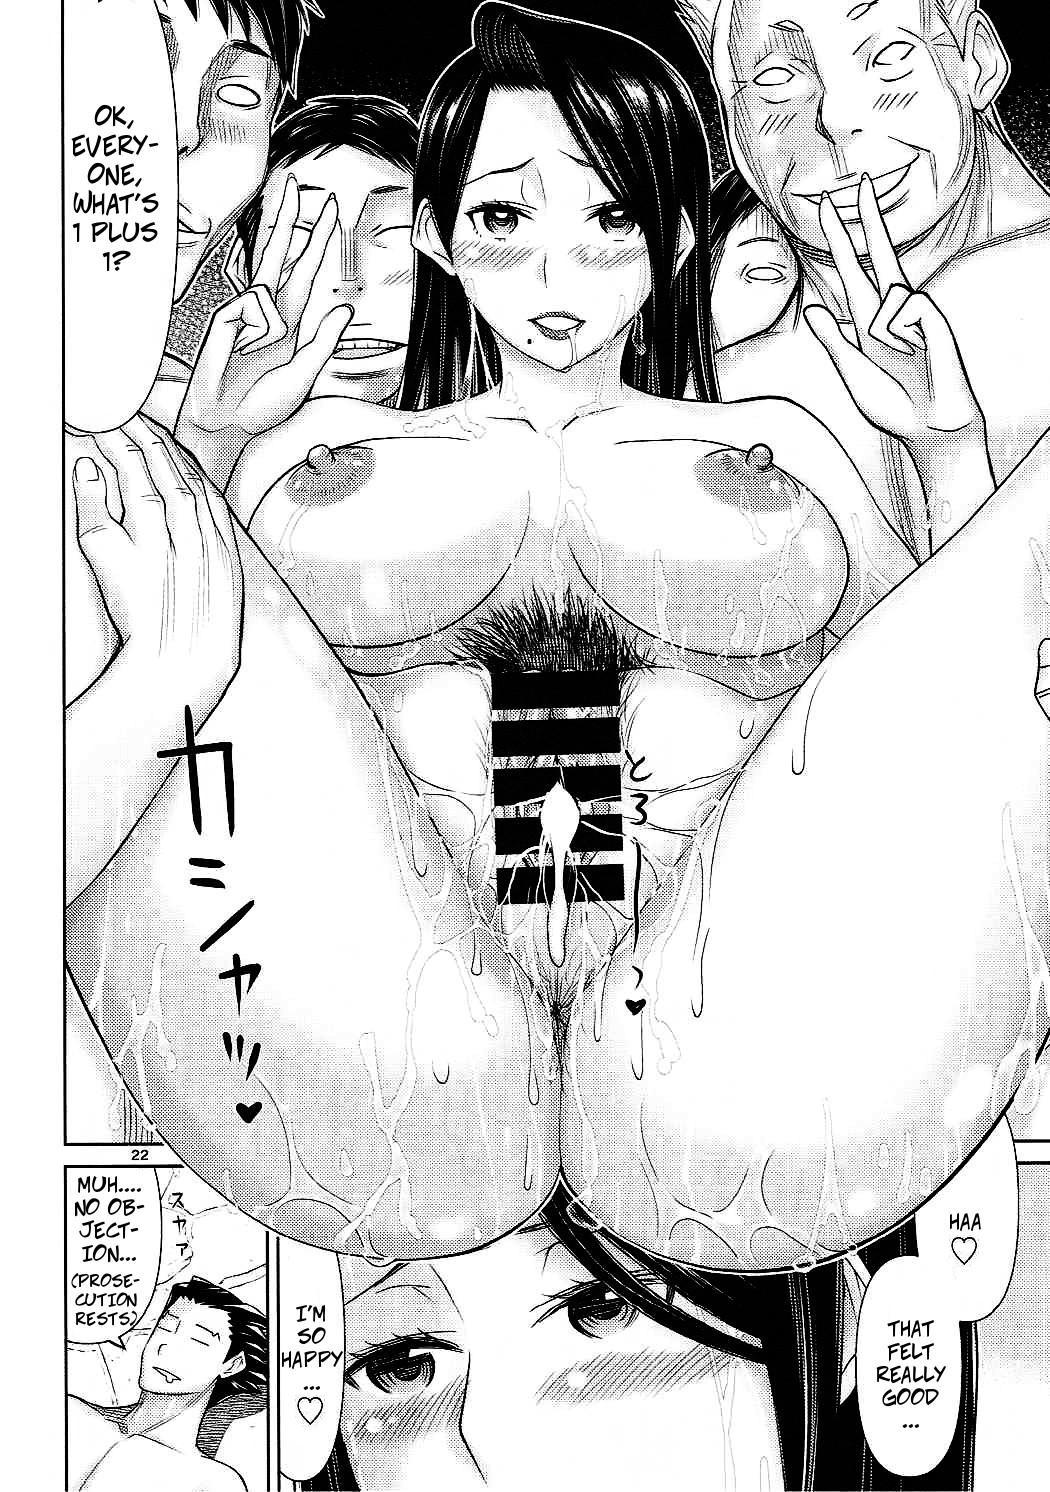 (C90) [Low Thrust (Tsunagami)] Igi nashi -- No Objection (Ace Attorney) [English] 20